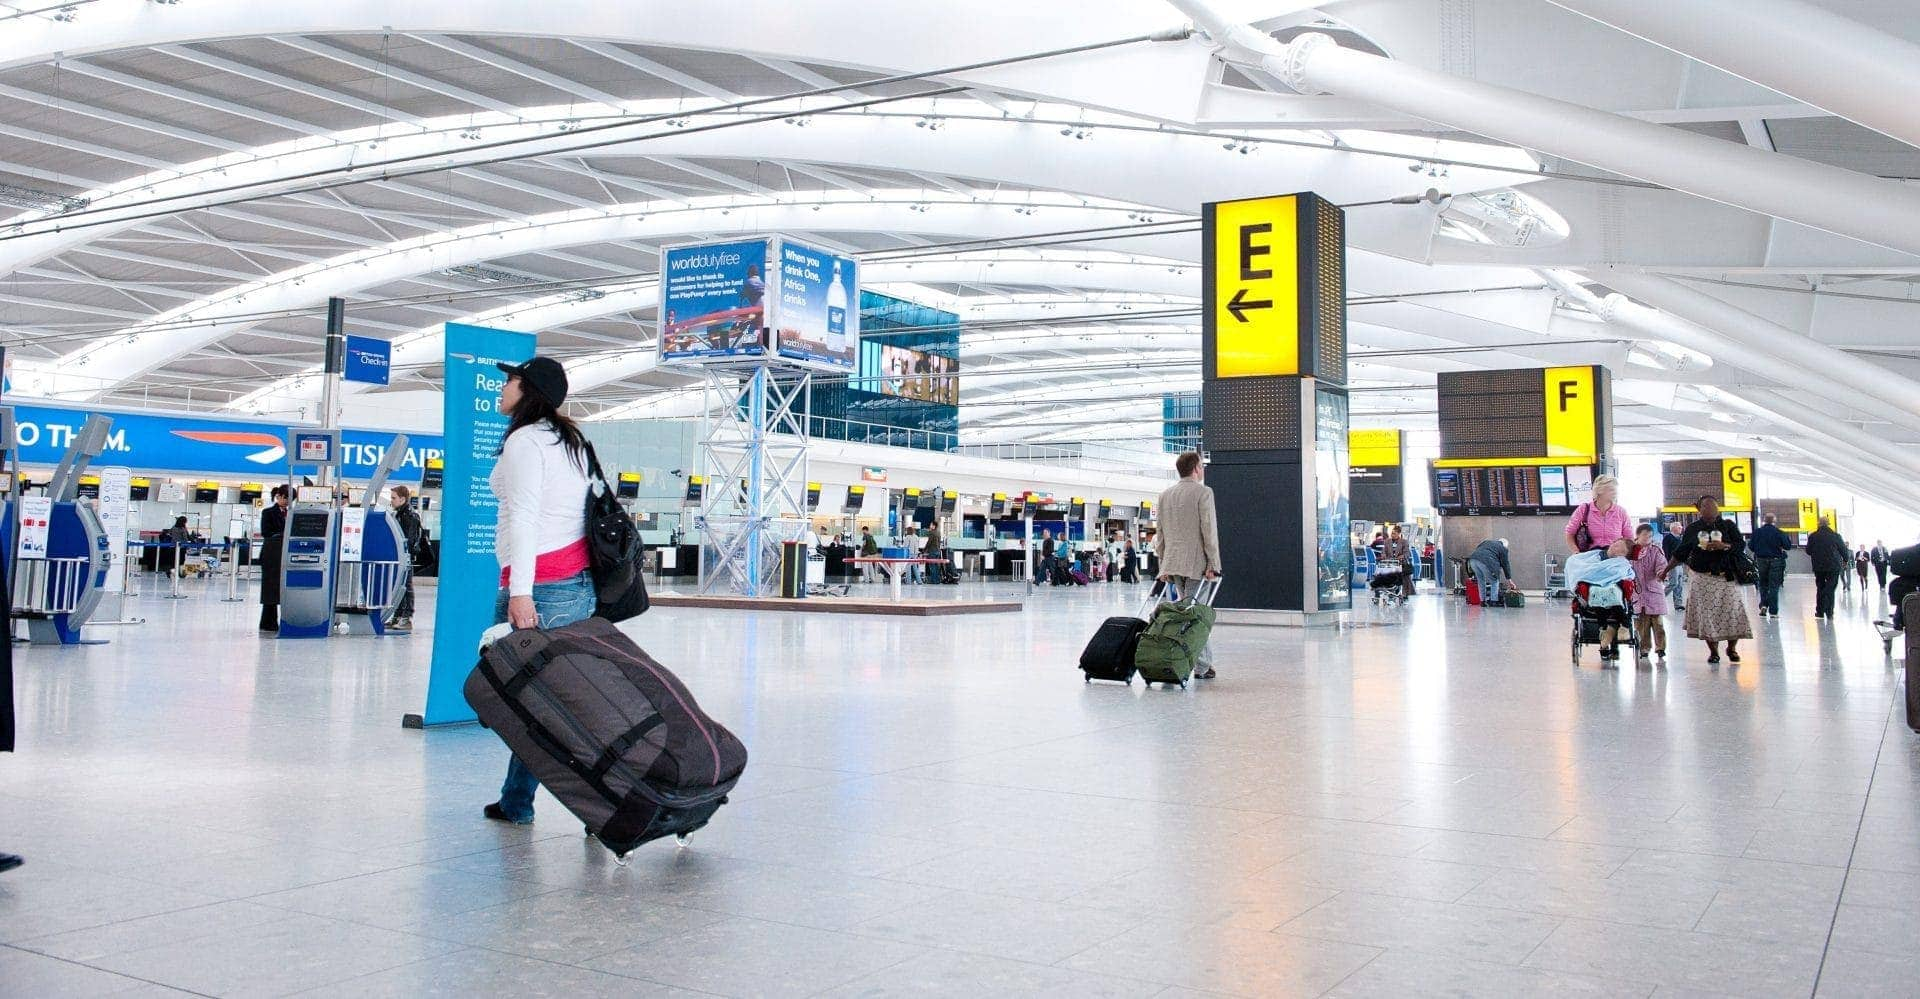 Aeropuerto de Heathrow t5